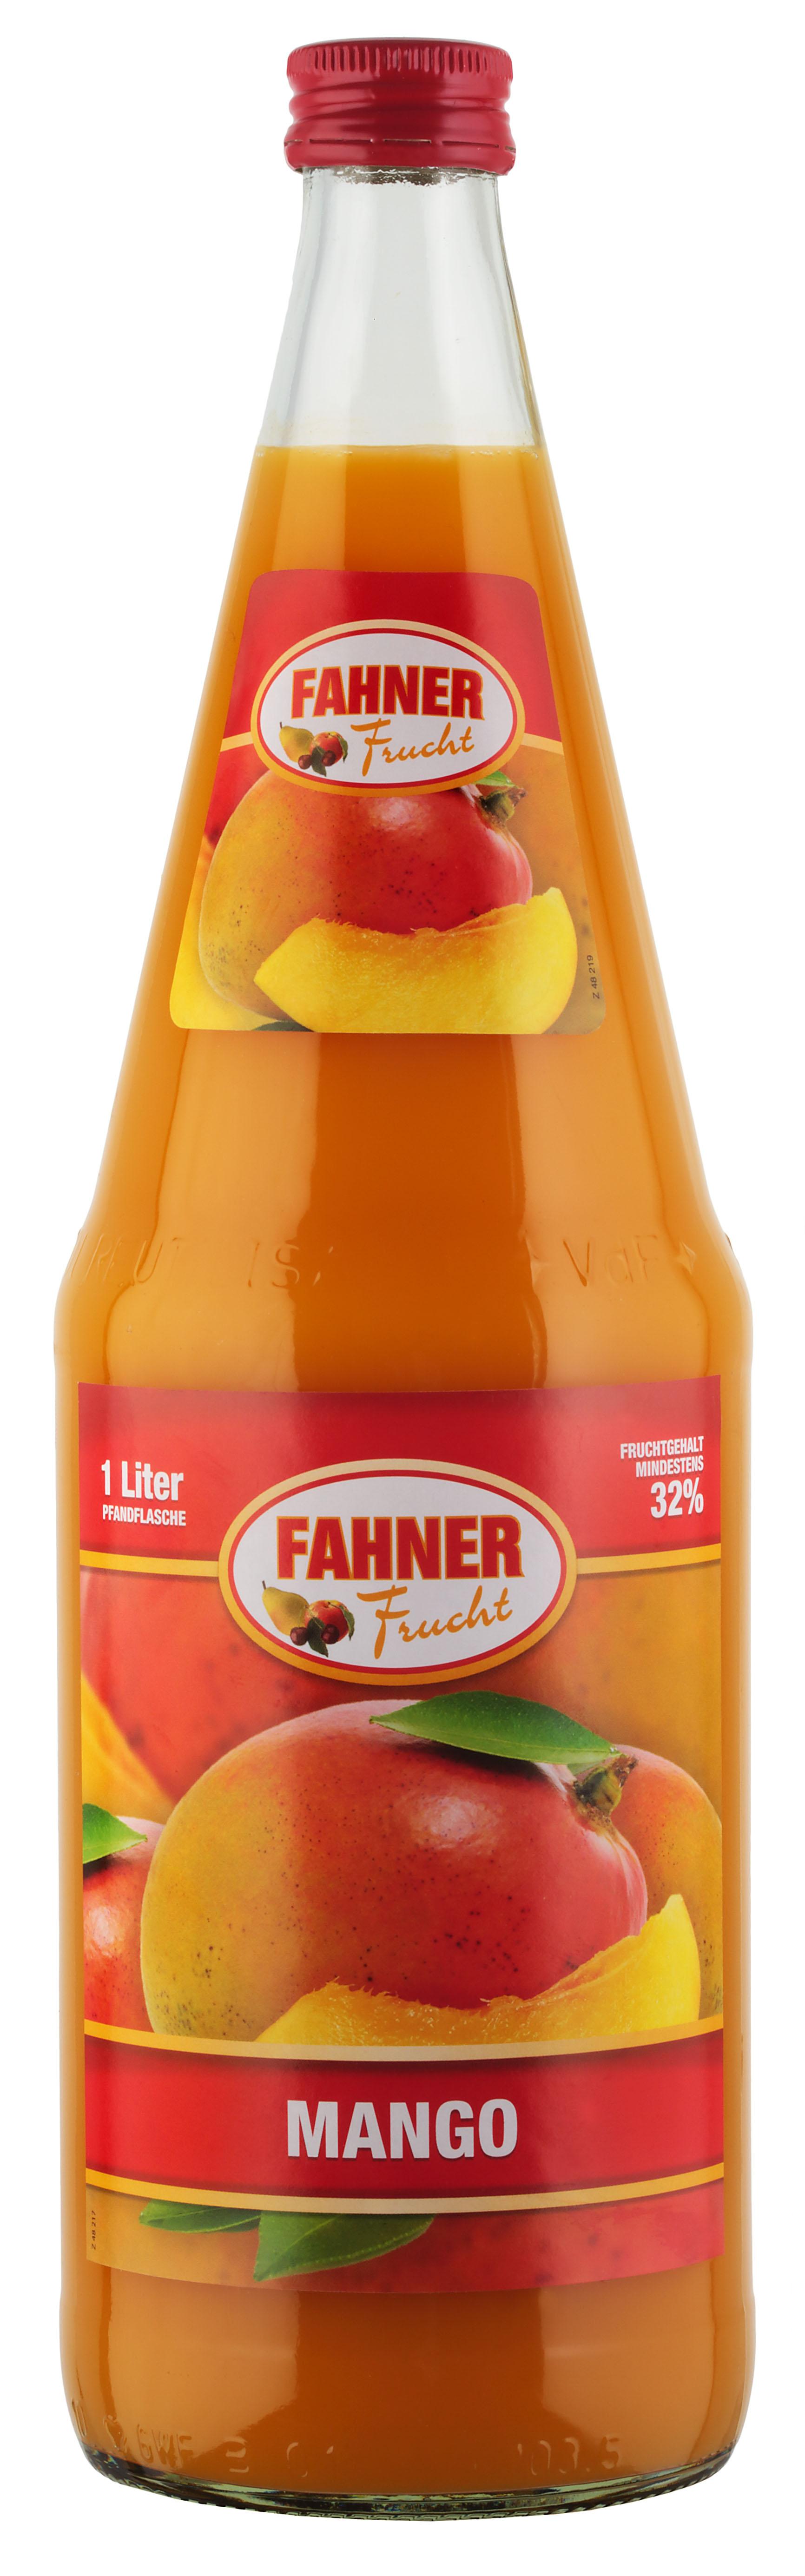 FAHNER Mango-Nektar 6x1 l